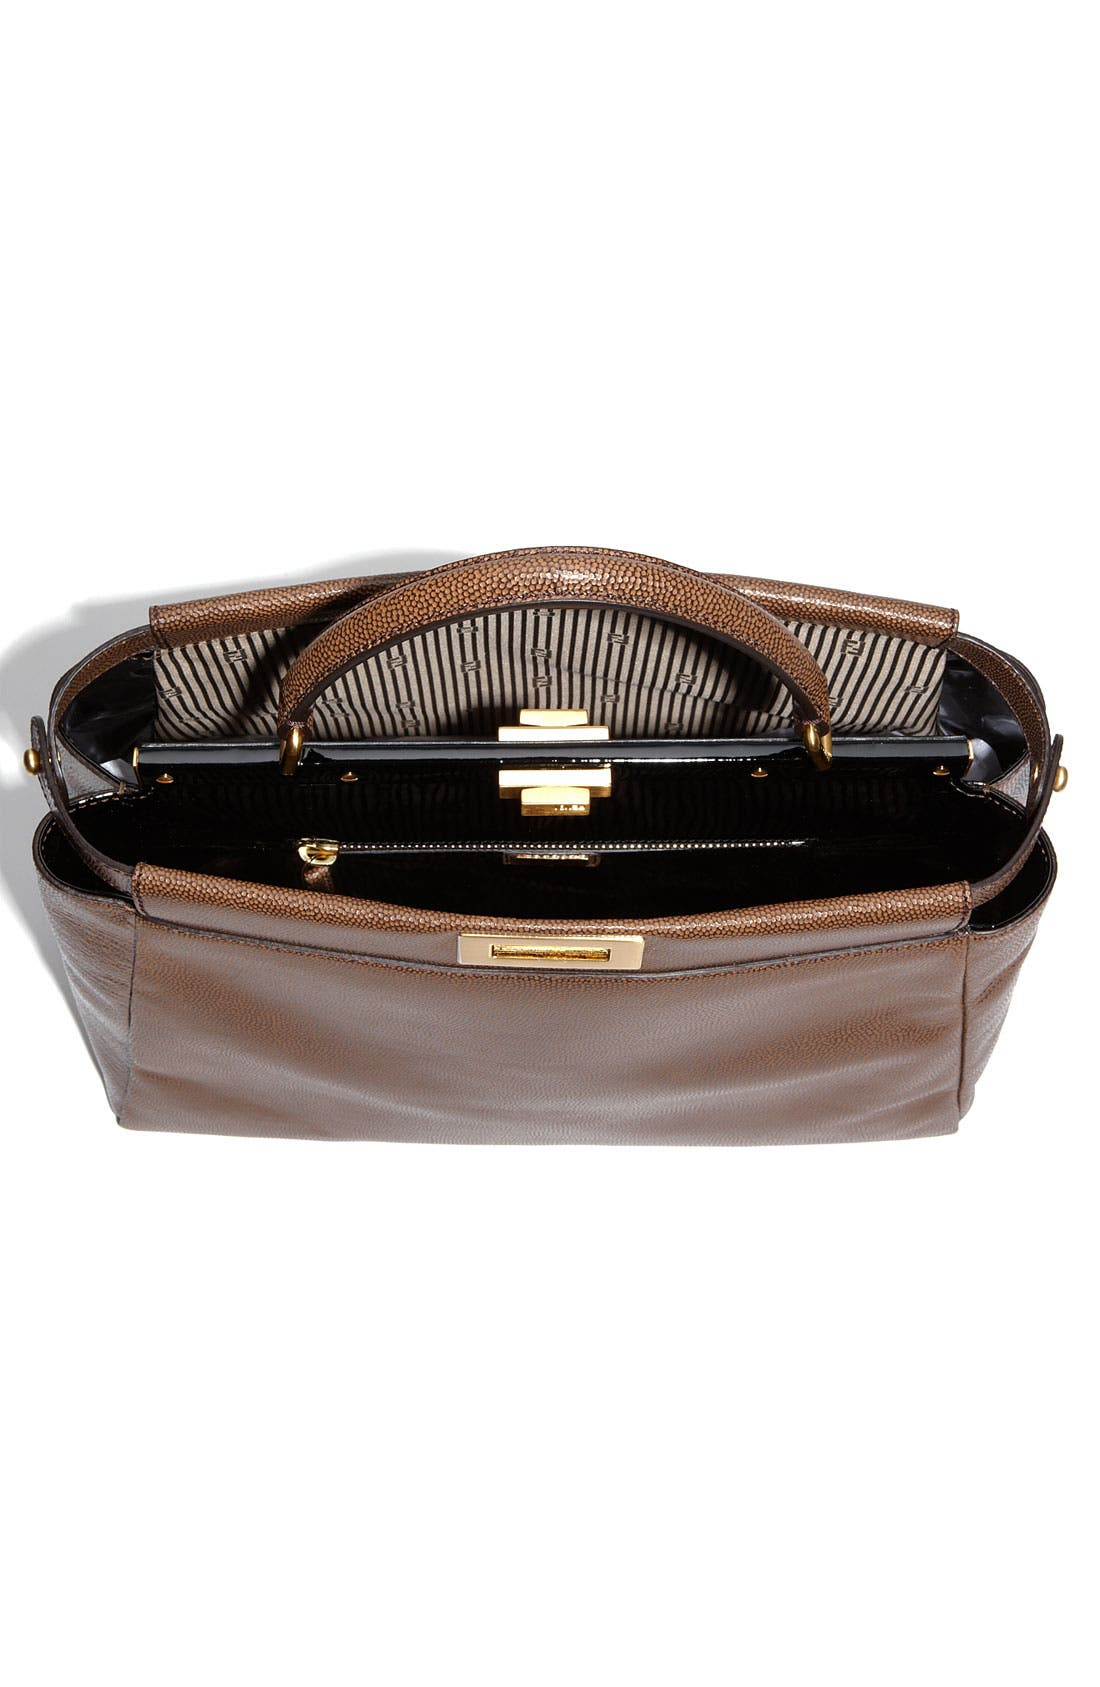 Alternate Image 3  - Fendi 'Peekaboo - Large' Glazed Leather Satchel